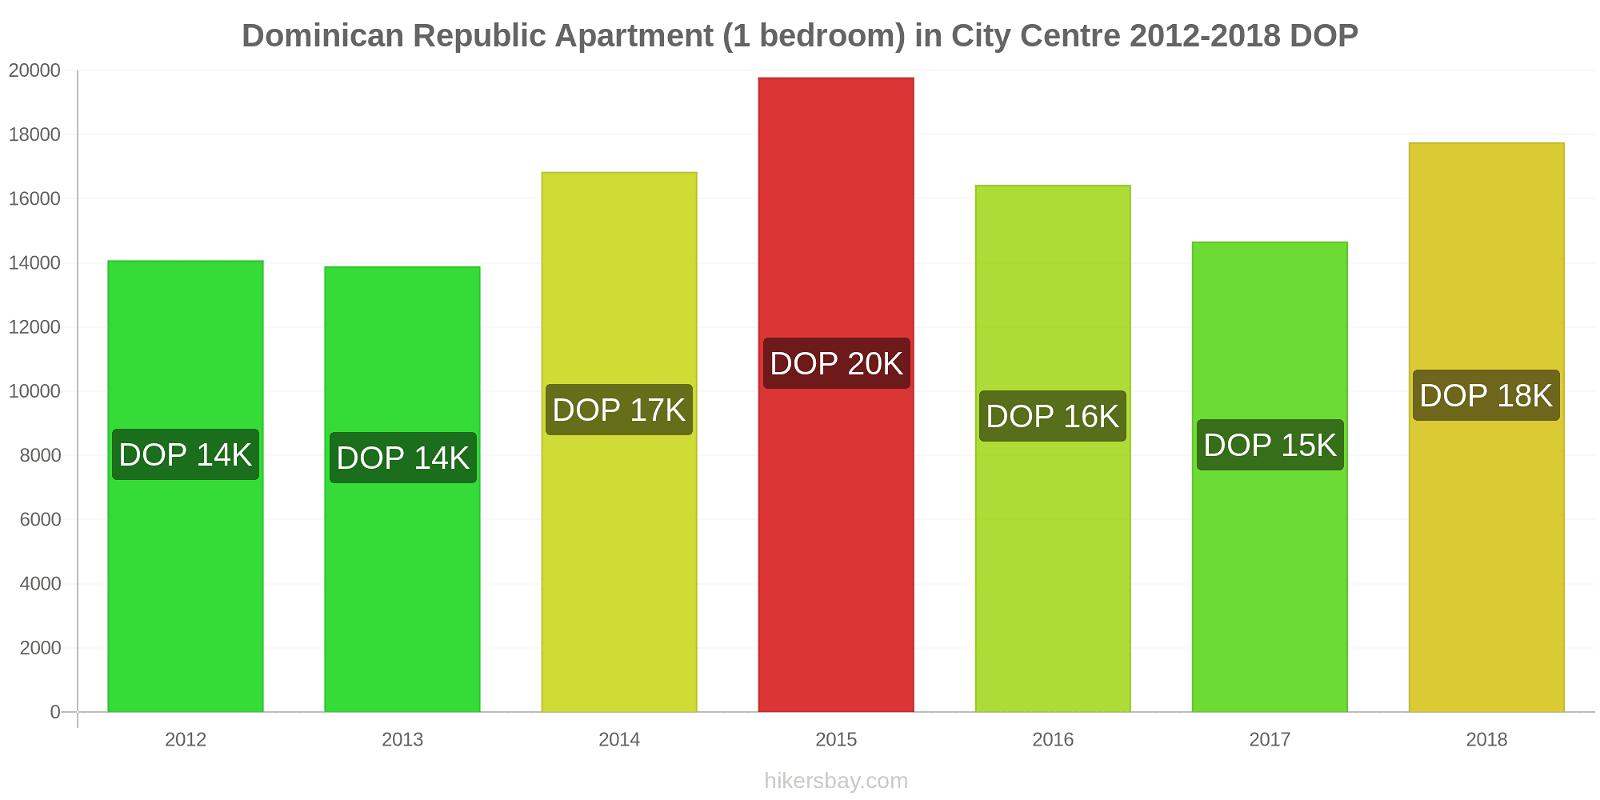 Dominican Republic price changes Apartment (1 bedroom) in City Centre hikersbay.com